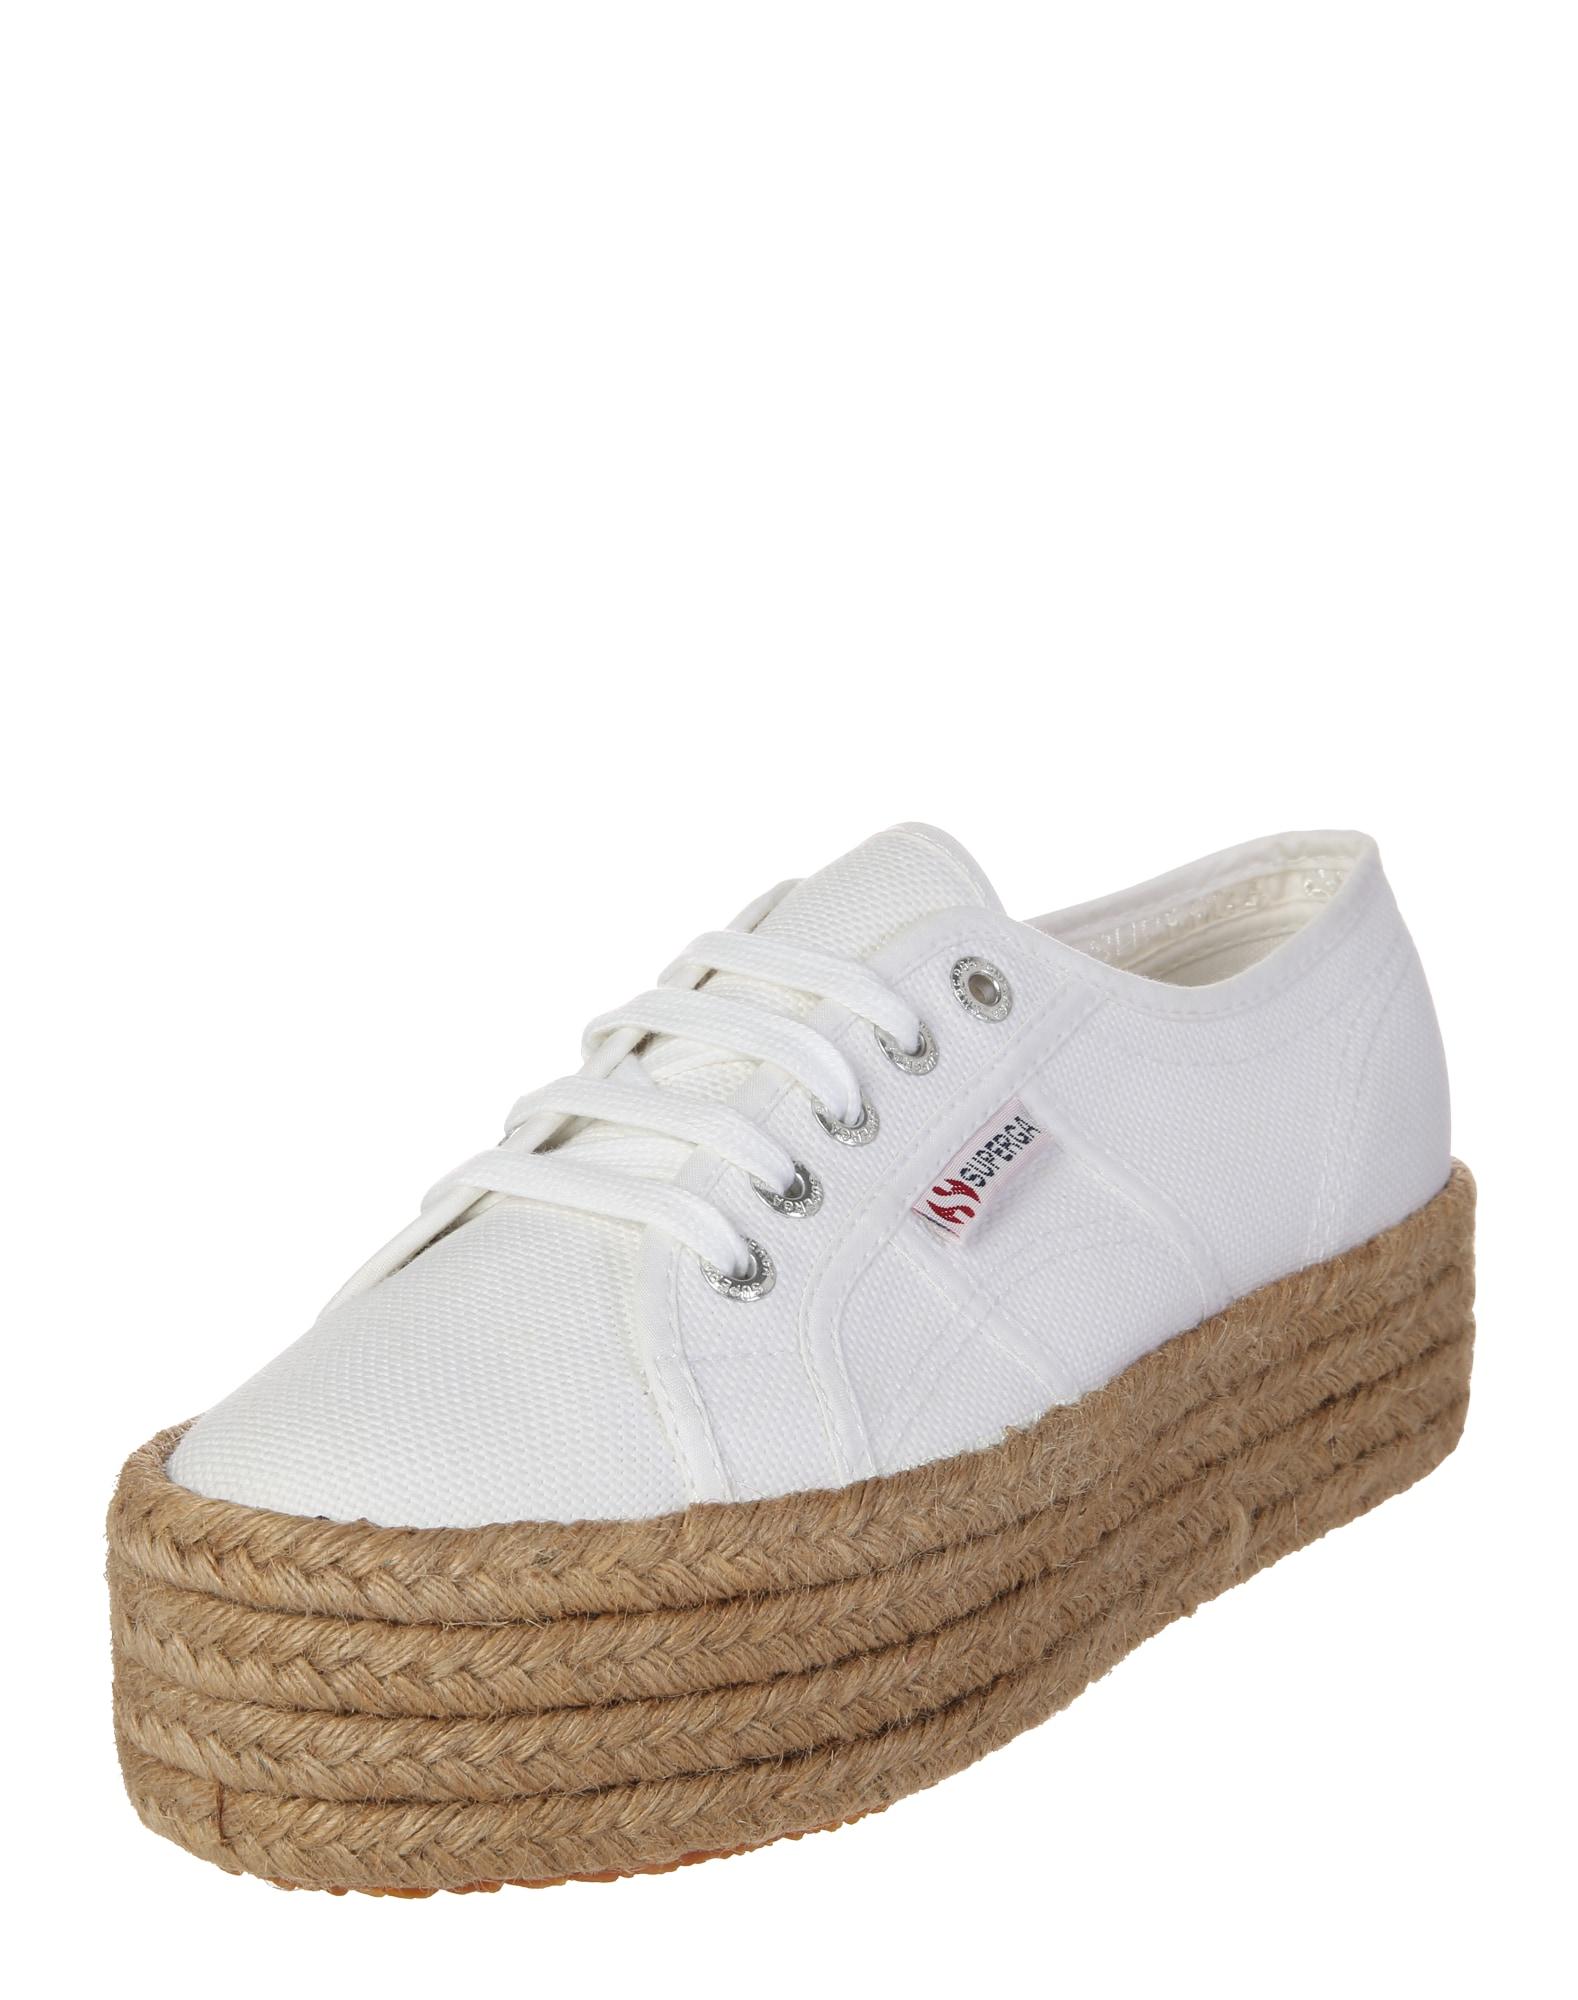 SUPERGA Sneaker low '2790 - COTROPEW'  nisip / alb